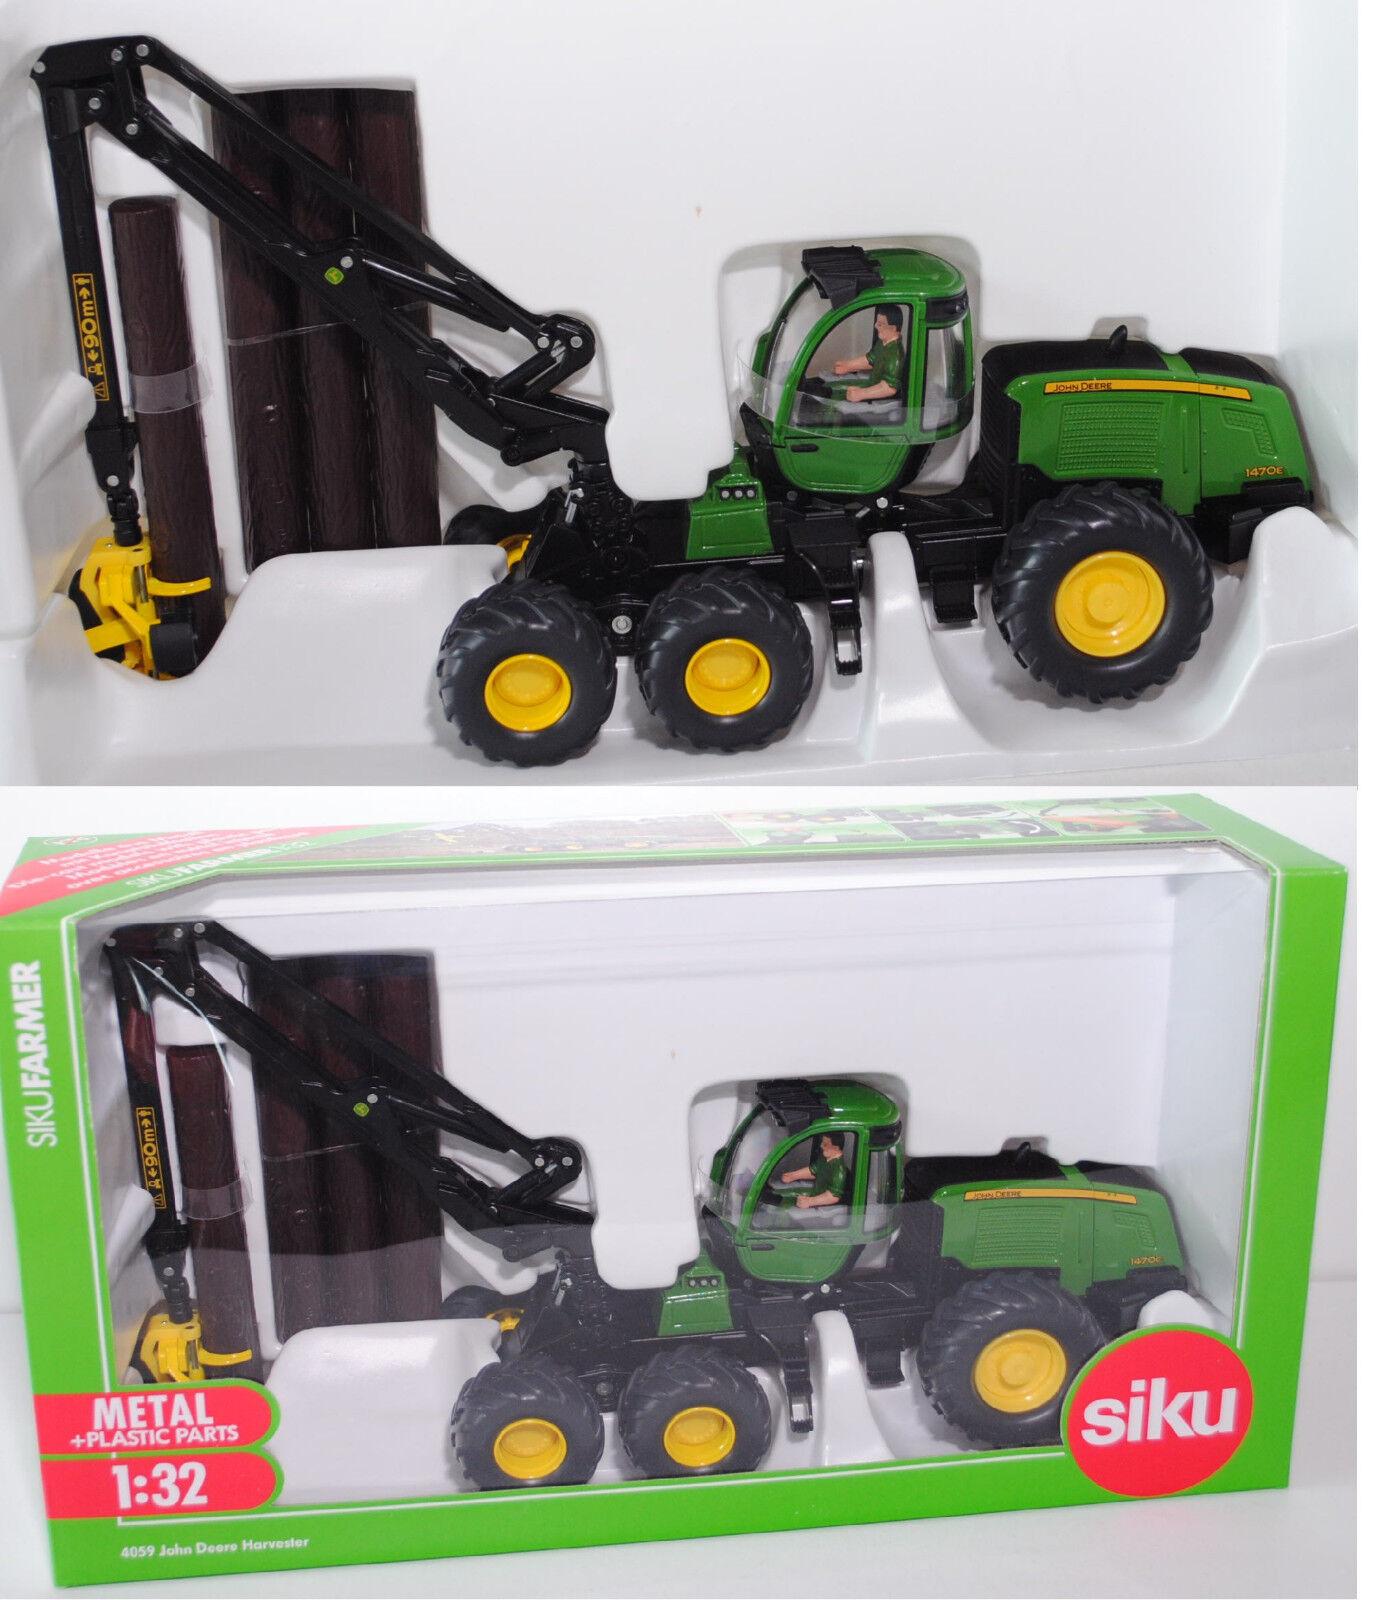 SIKU FARMER 4059 John Deere moissonneuse  1470e, 1 32, NEUF dans sa boîte  choisissez votre préférée